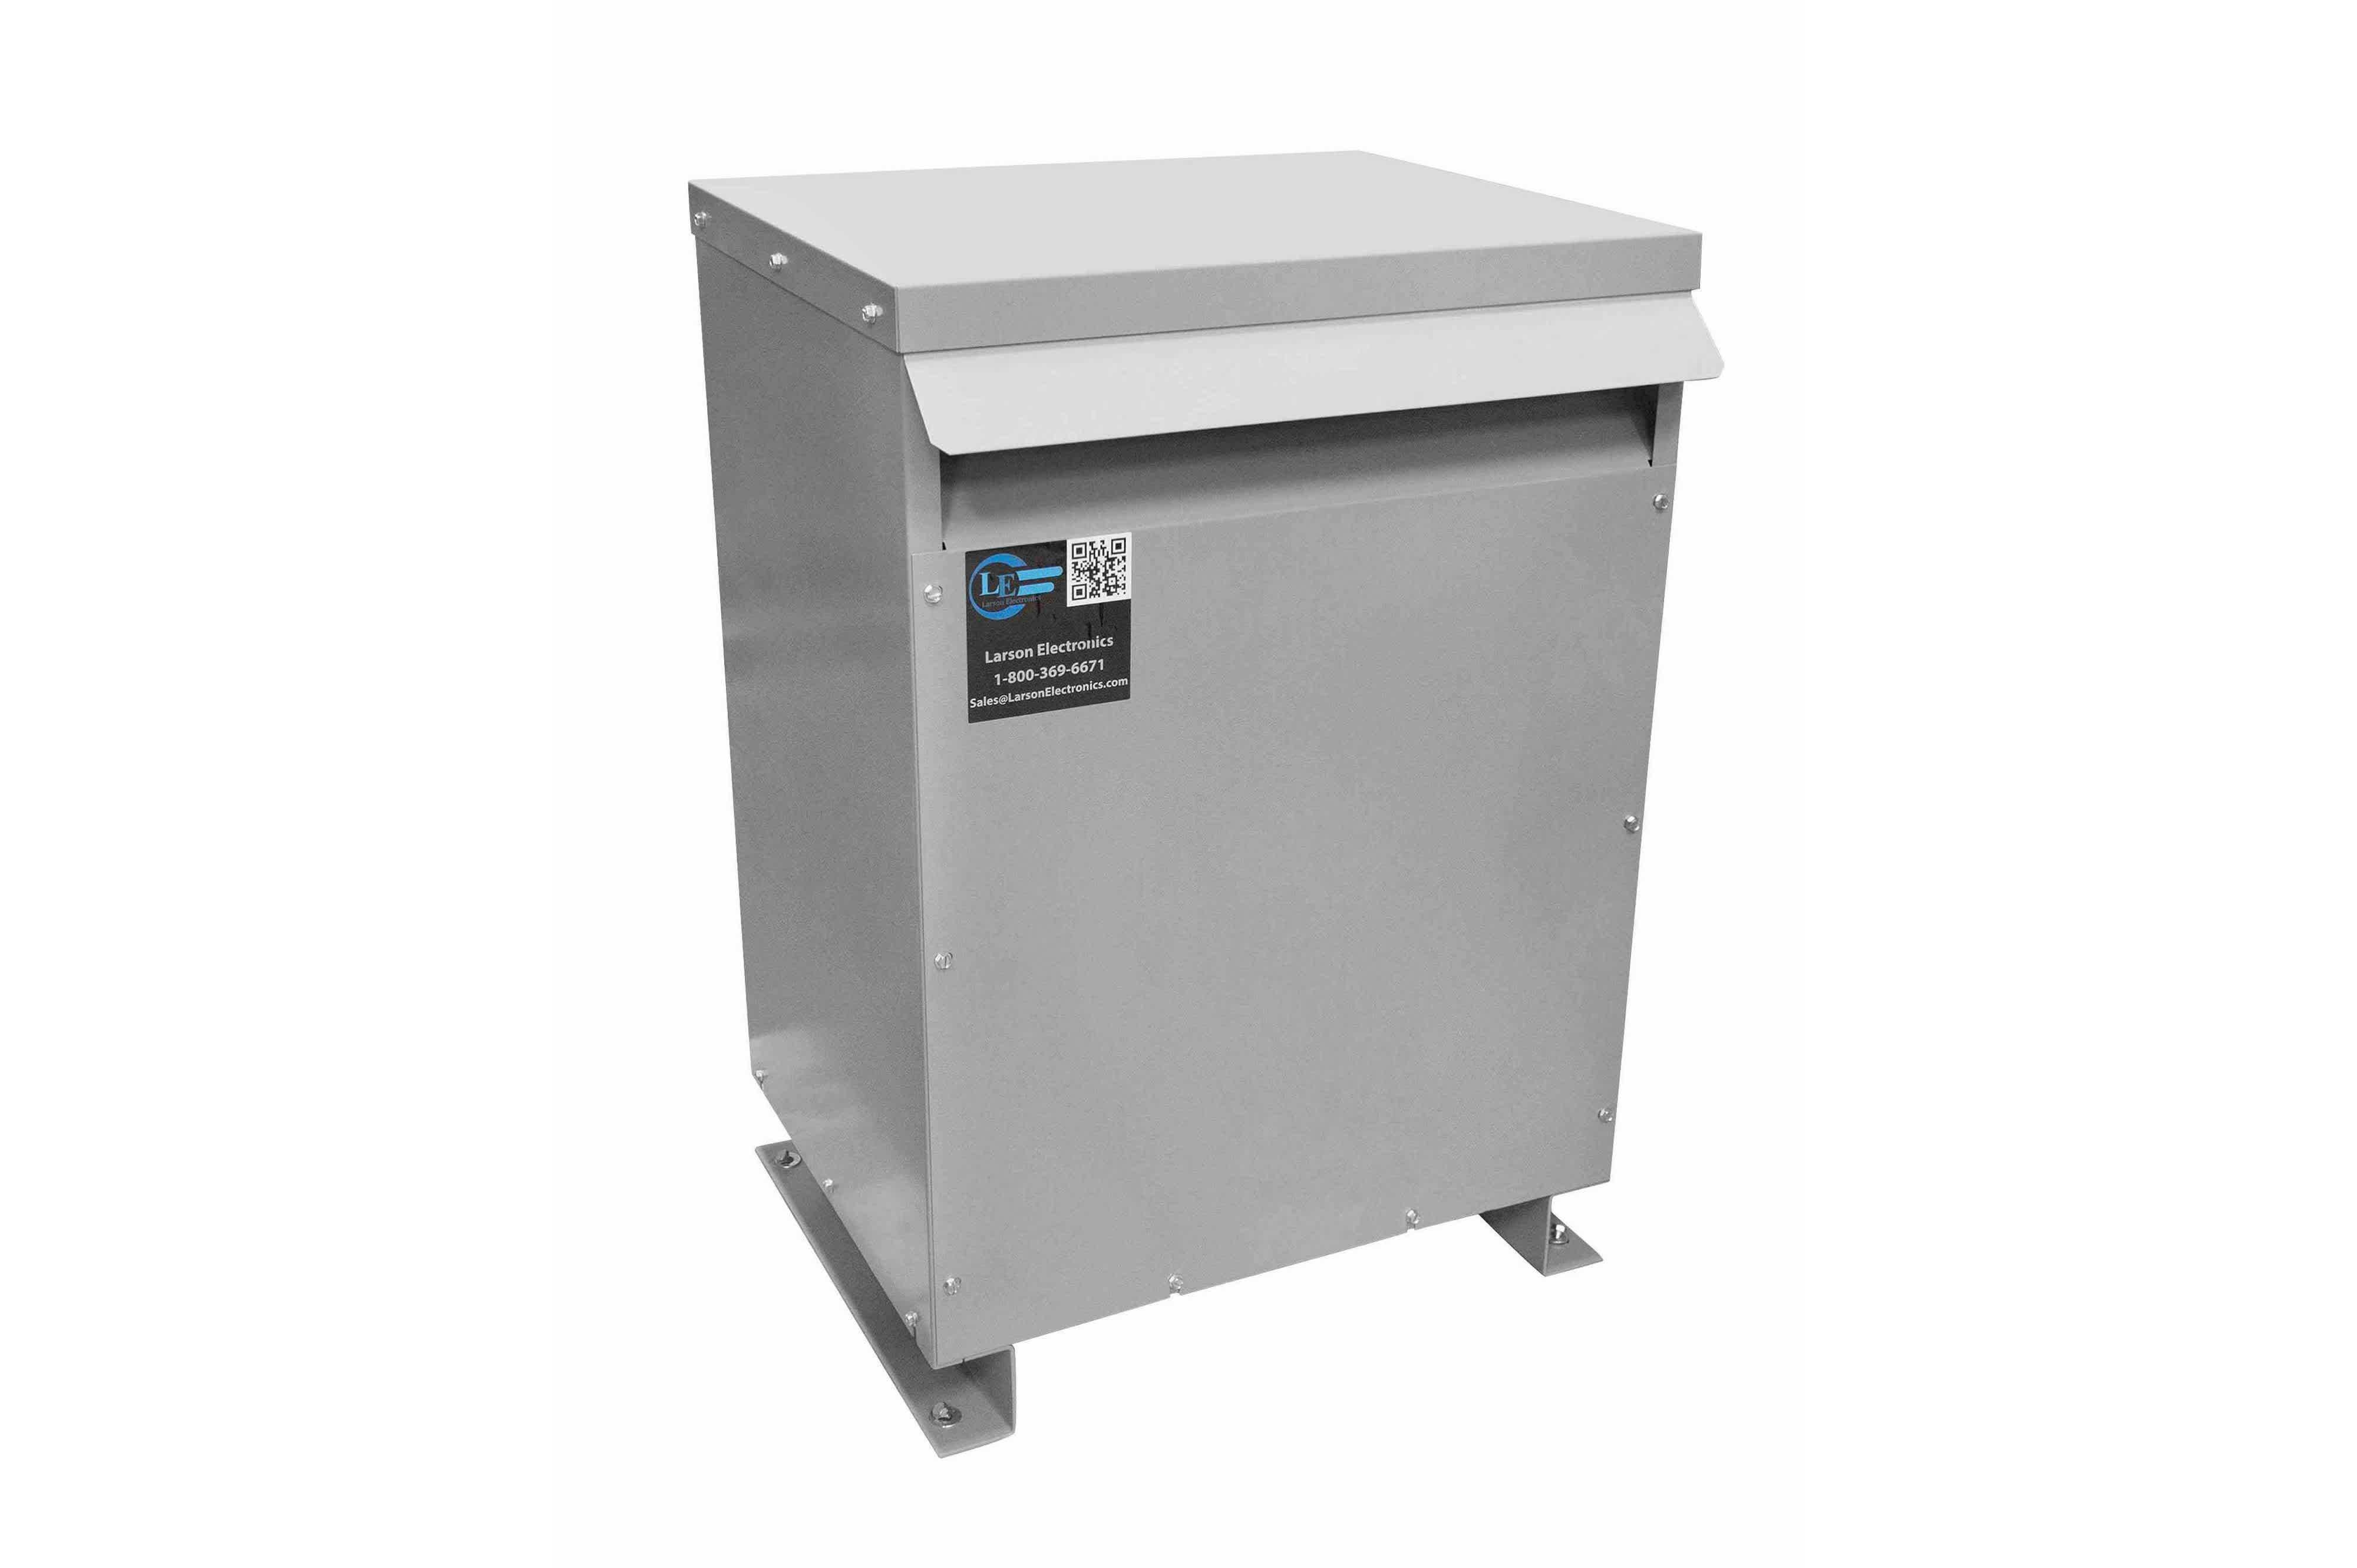 50 kVA 3PH DOE Transformer, 460V Delta Primary, 415Y/240 Wye-N Secondary, N3R, Ventilated, 60 Hz